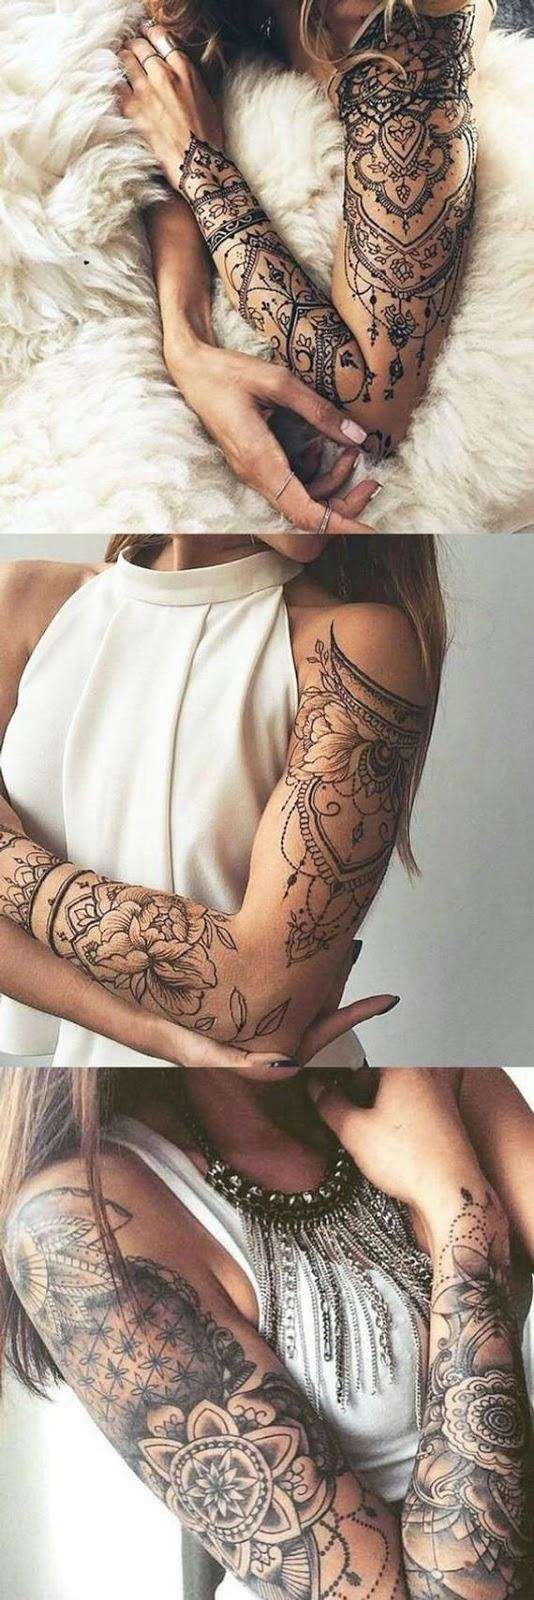 Cool Tribal Tattoos Designs (17)